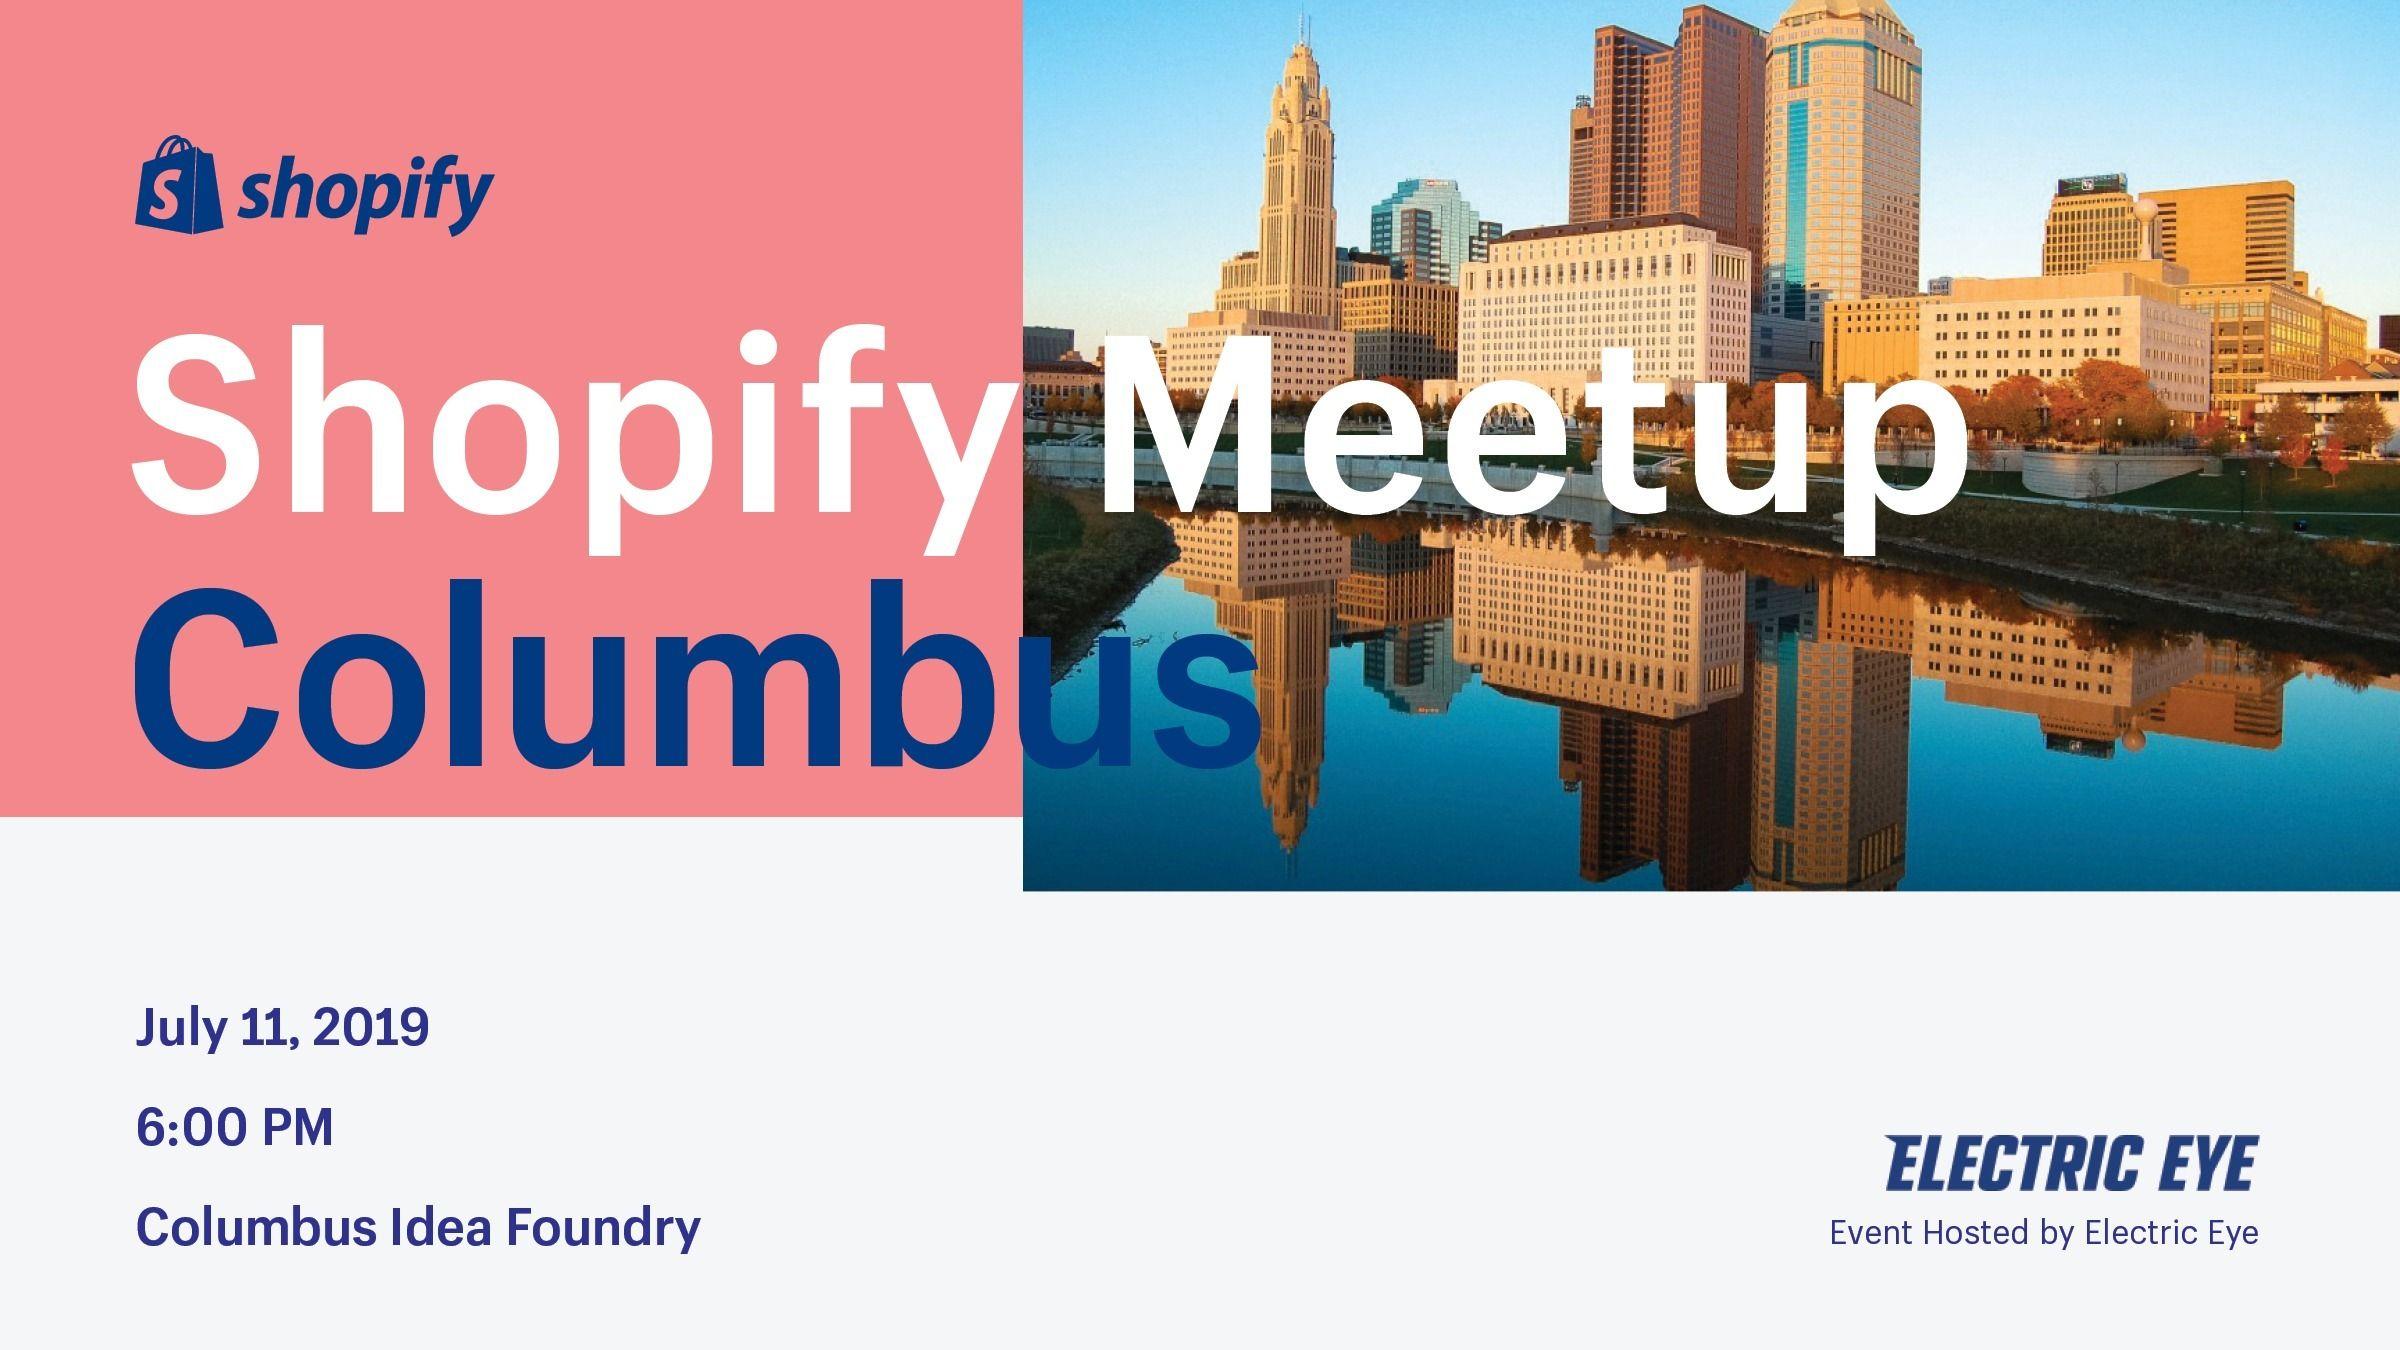 Shopify Meetup Columbus